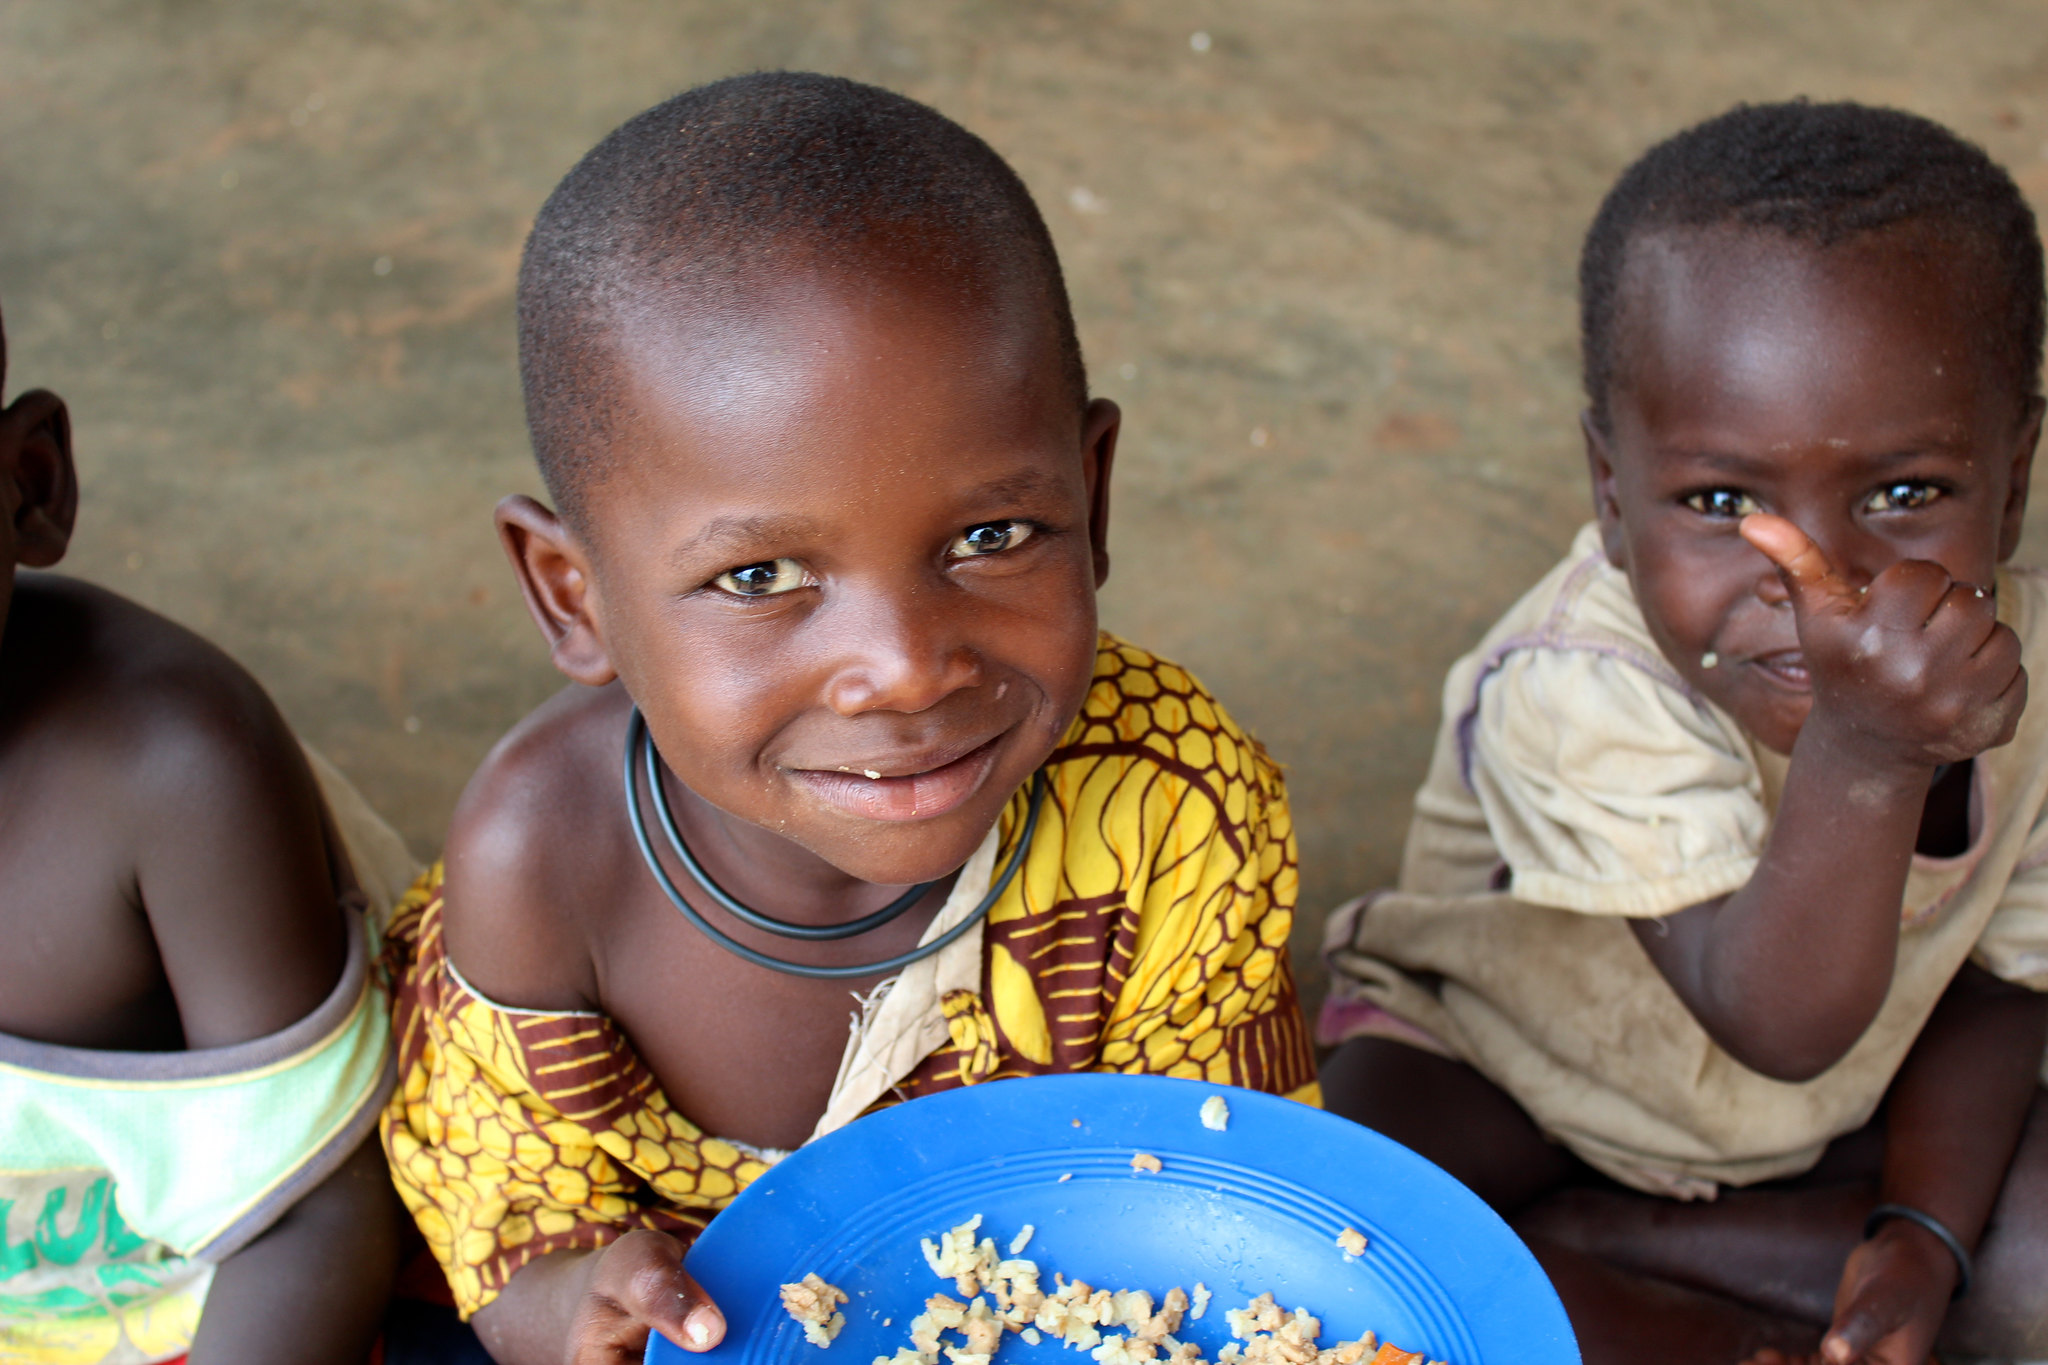 Serving Uganda's poor during COVID-19